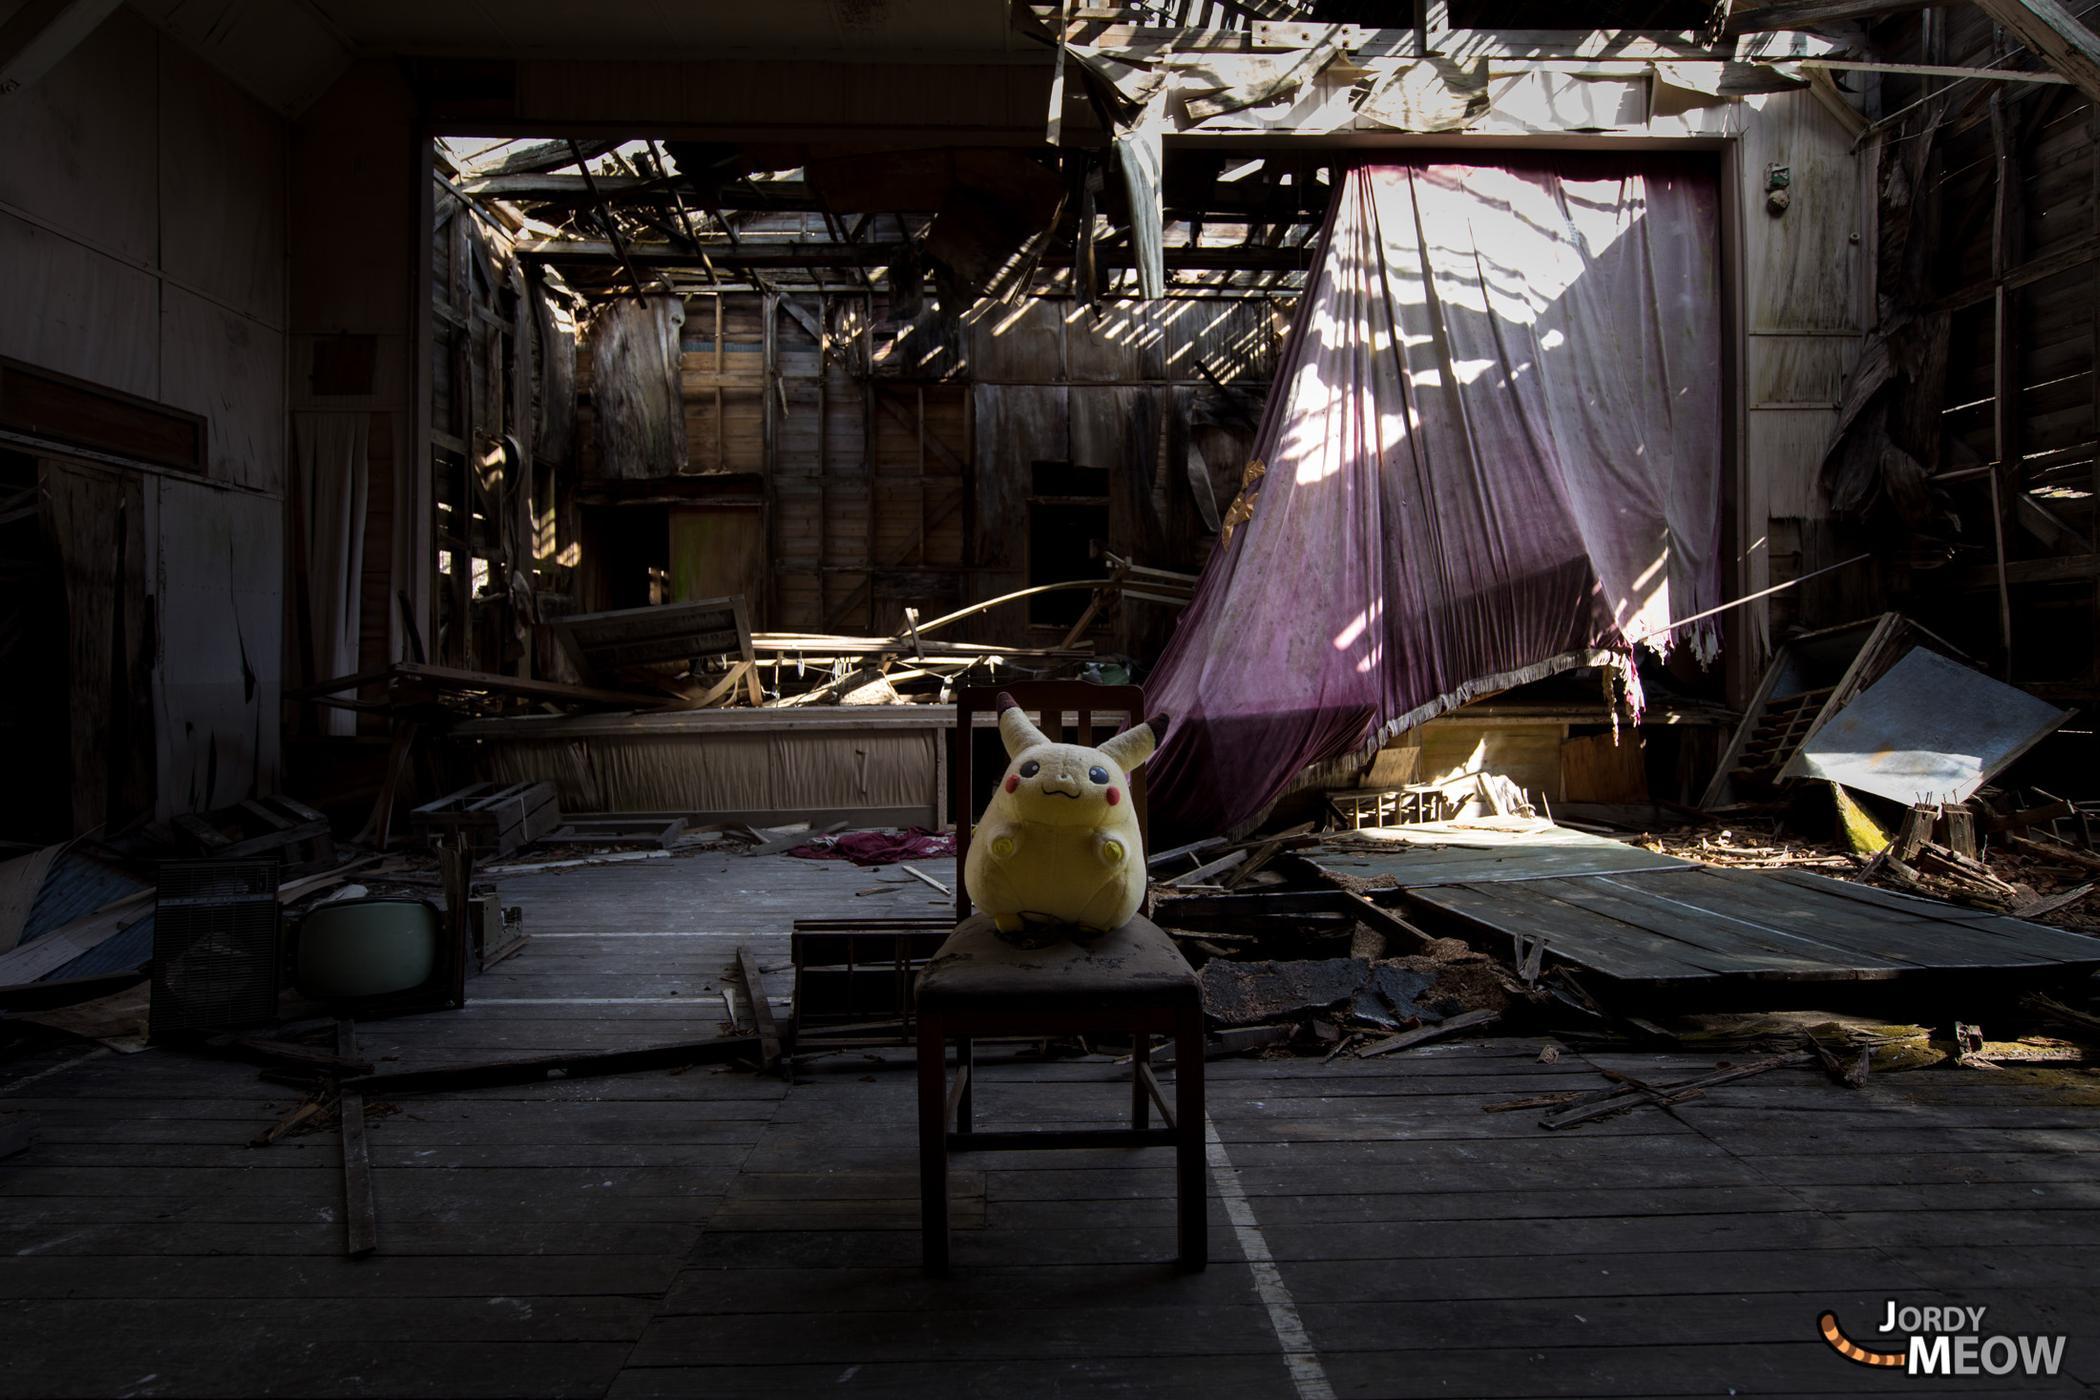 abandoned, chichibu, french, haikyo, japan, japanese, kanto, people, pikachu, ruin, saitama, urban exploration, urbex, village